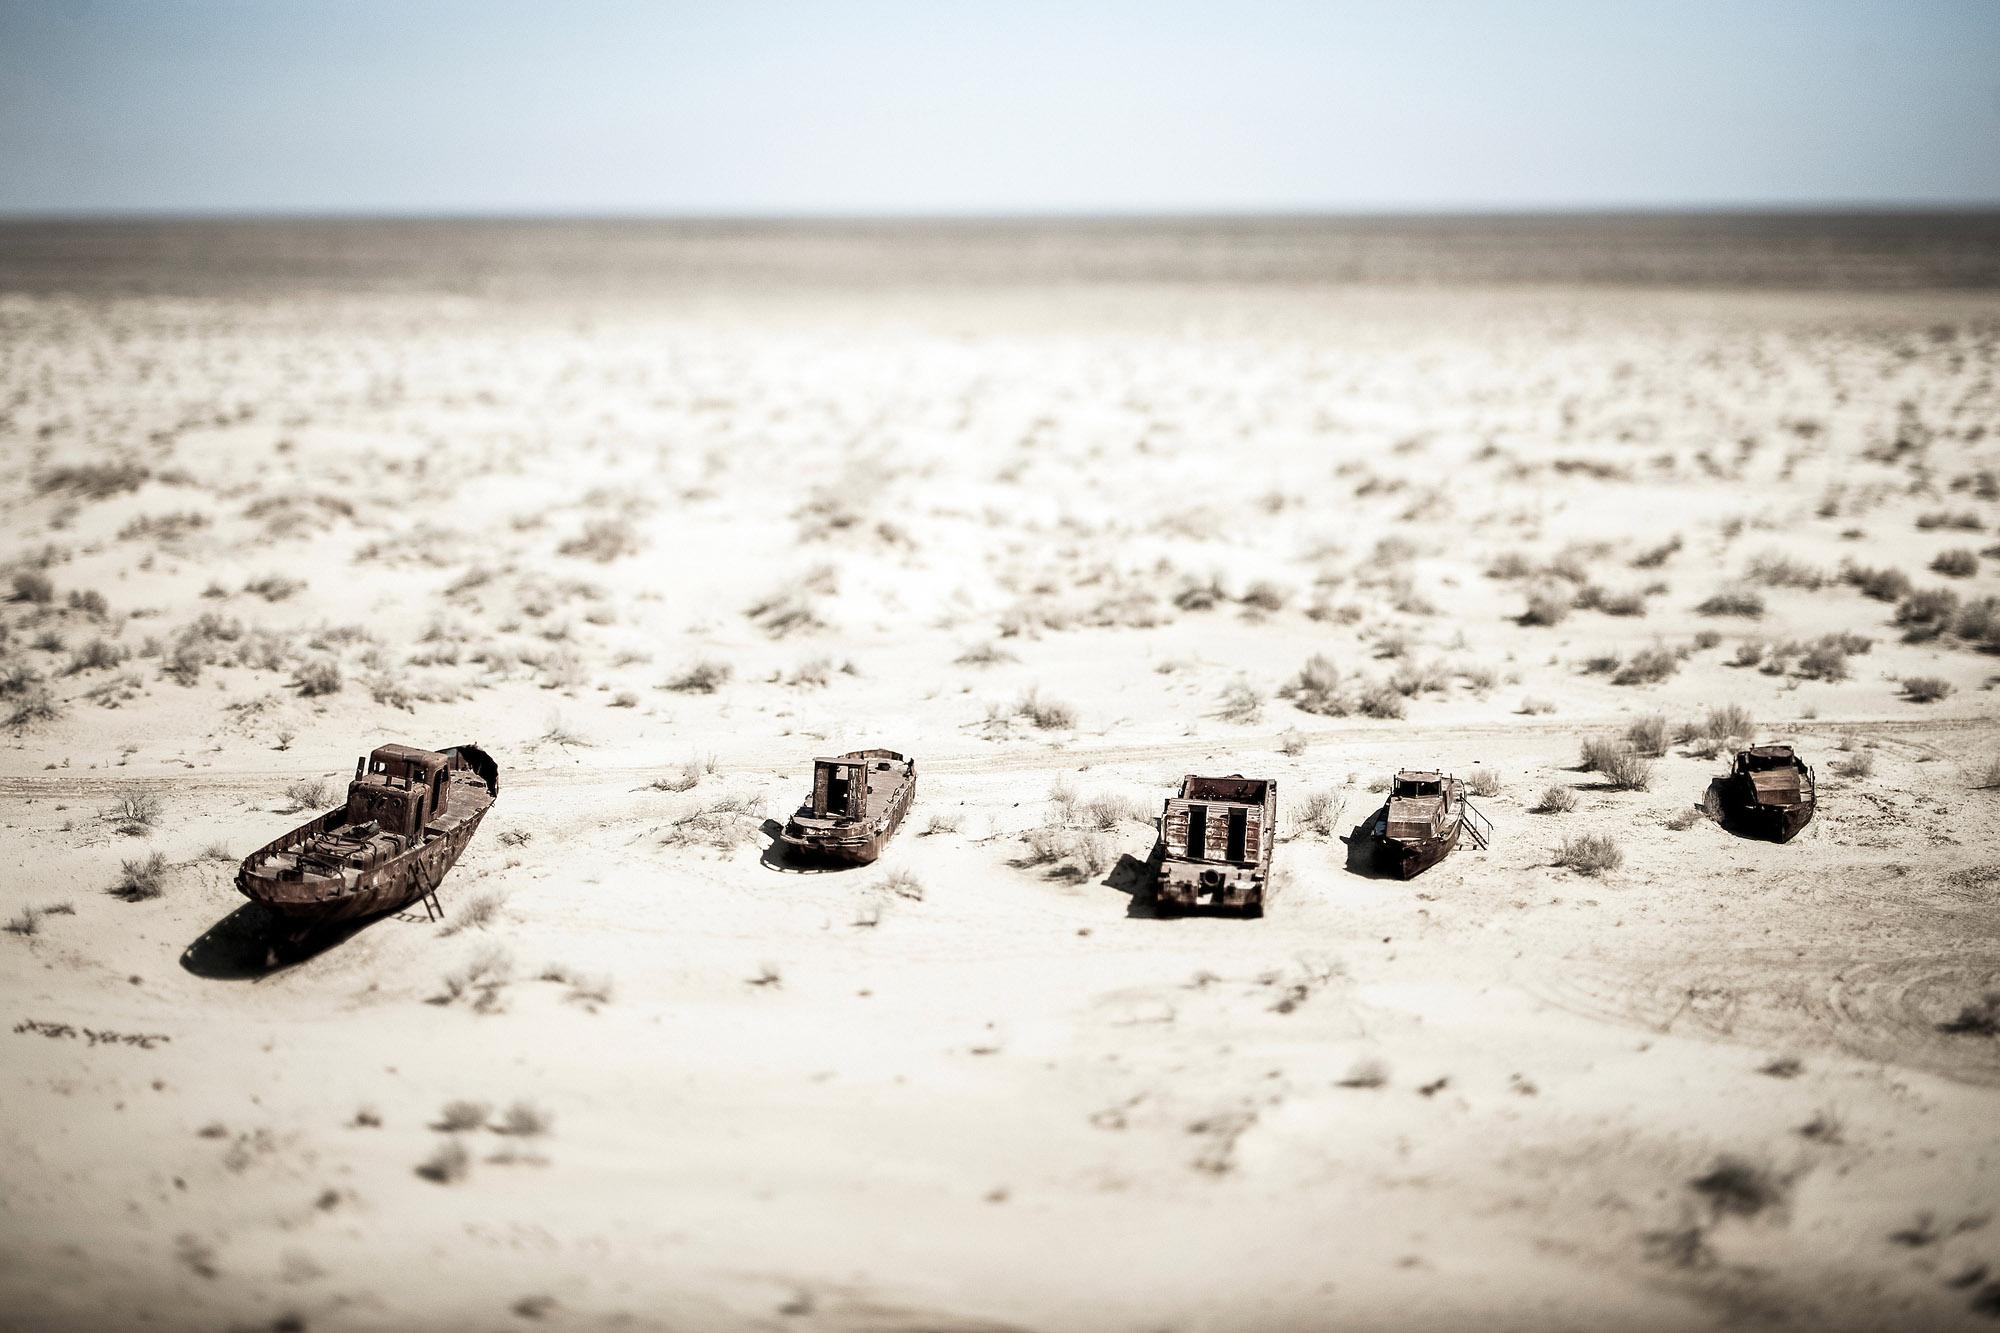 Boat Cemetery in the Aral sea, Moynaq, Uzbekistan